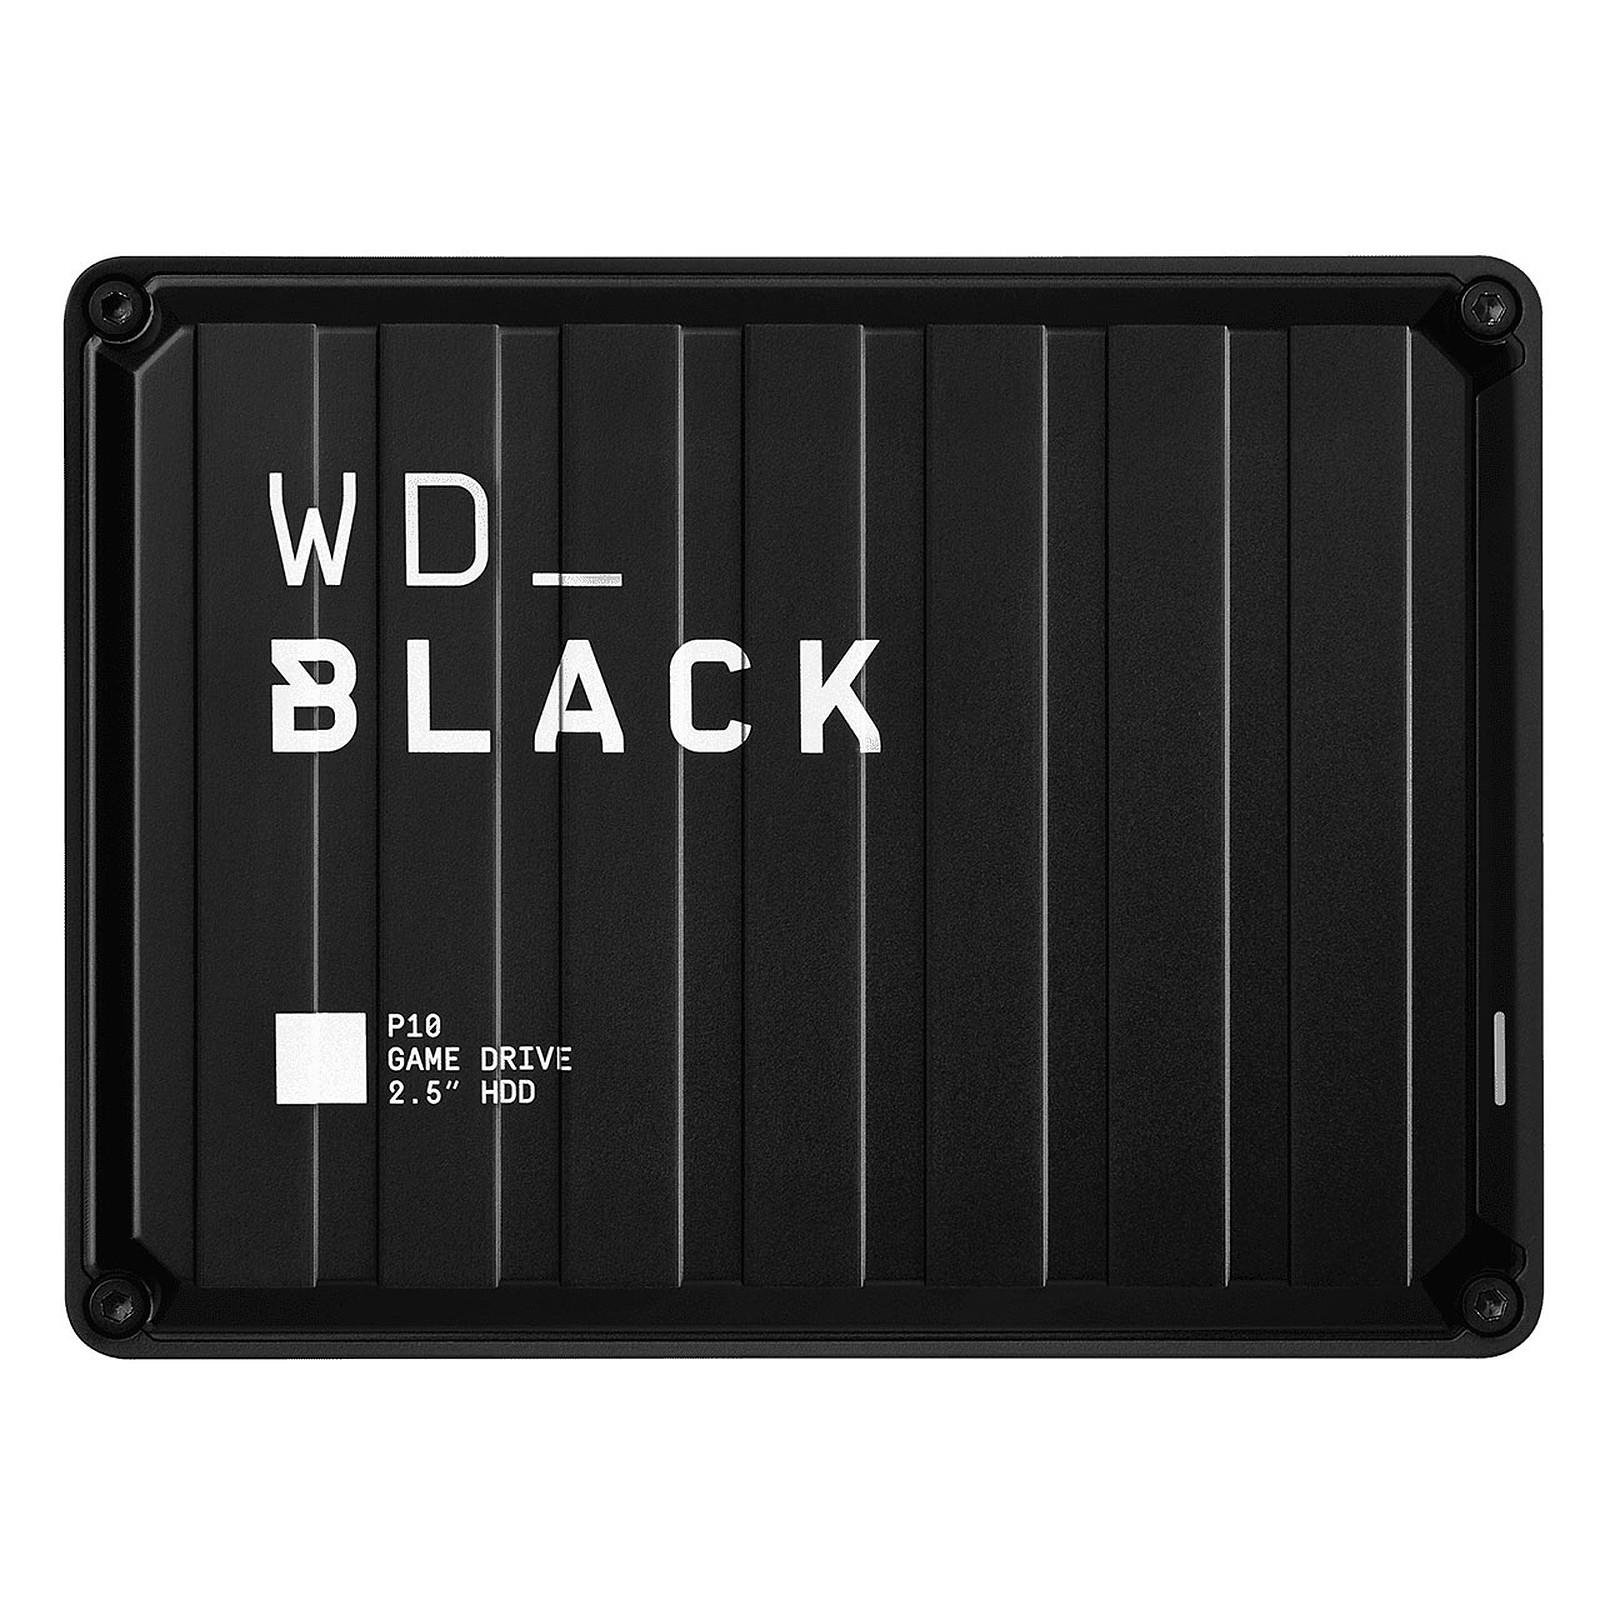 WD_Black P10 Game Drive 2 TB